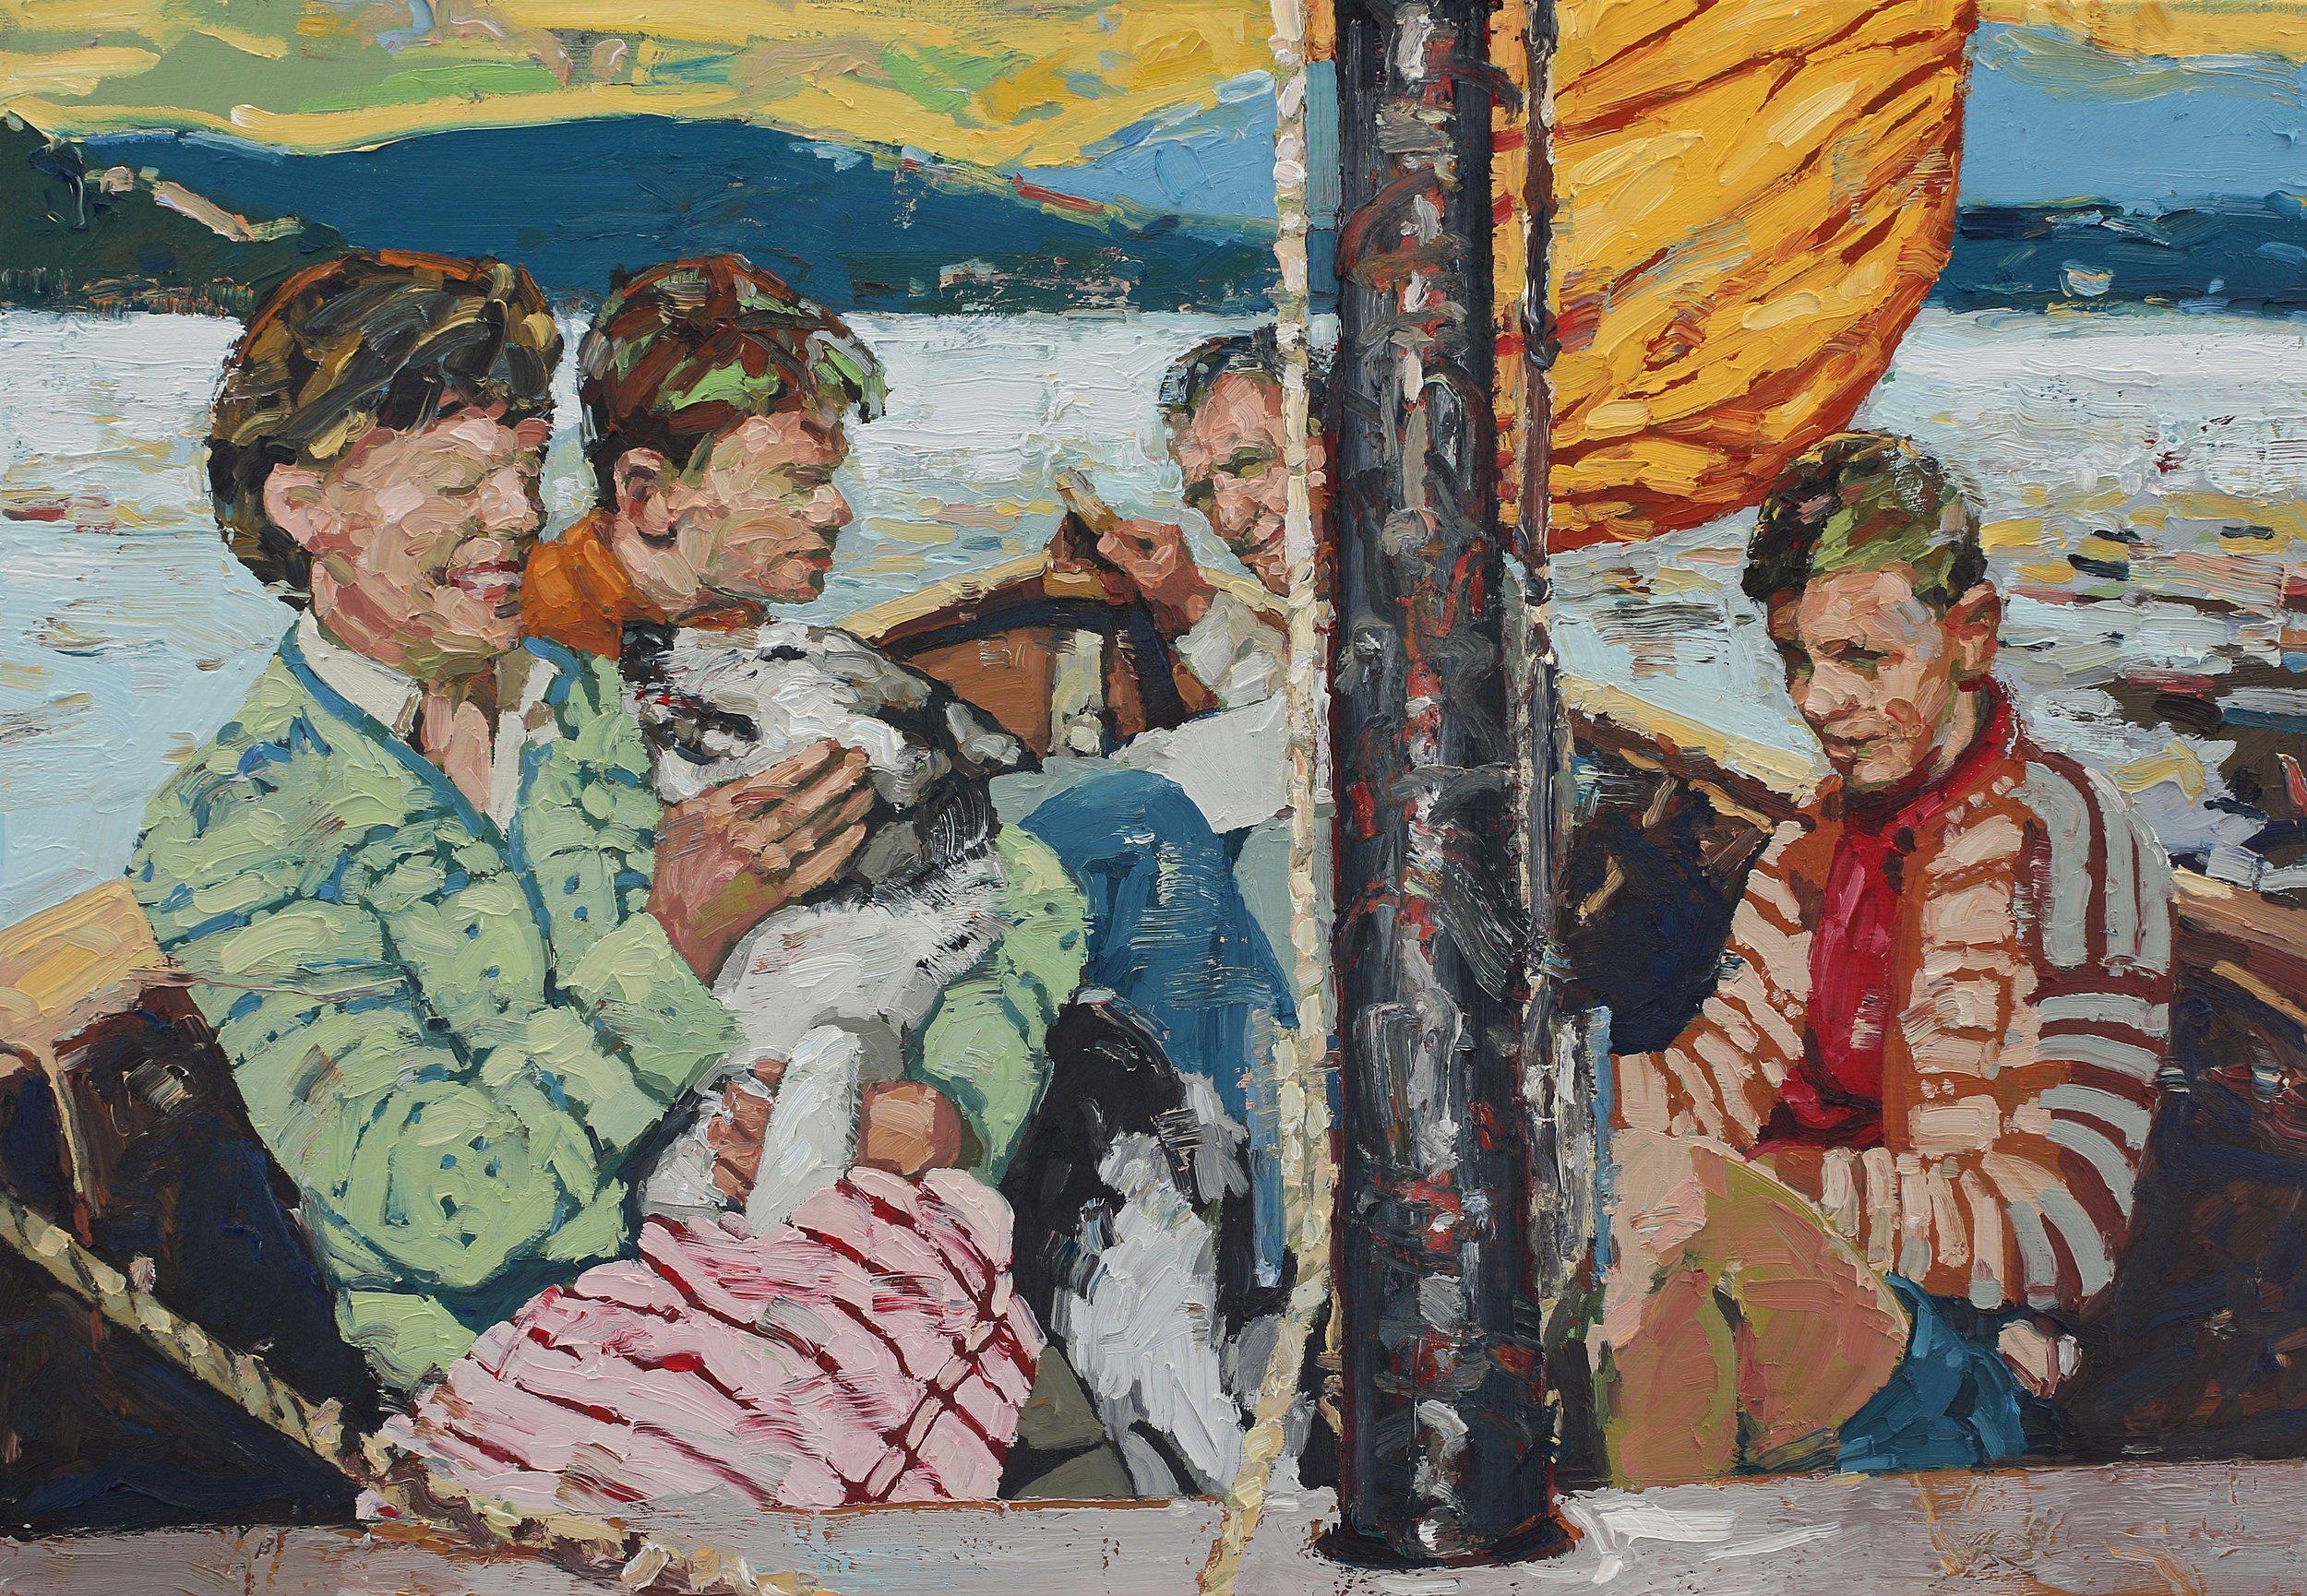 Søndag på fjorden – 90x130 cm – Eggoljetempera på lerret. RJD Gallery